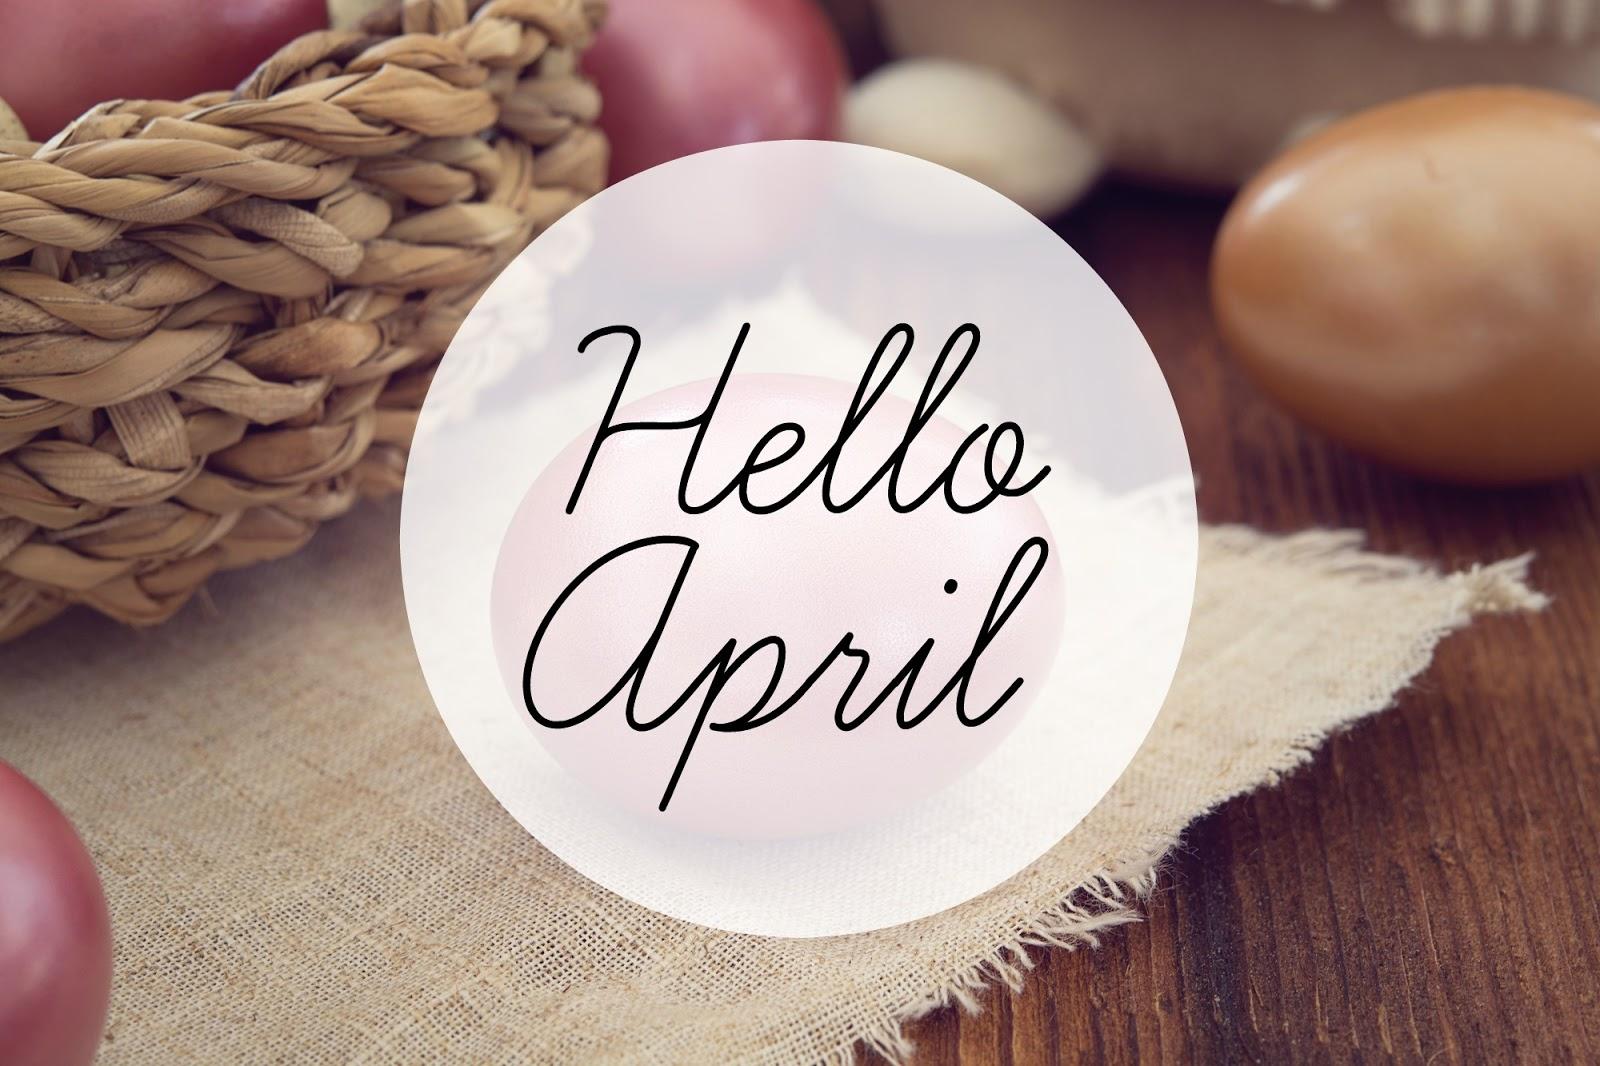 Formidable Joy | Formidable Joy Blog | Lifestyle | Hello April | The Maine | Ghost in the Shell | The Handmaid's Tale | Peskys | Peskys Vegan Brunch Club